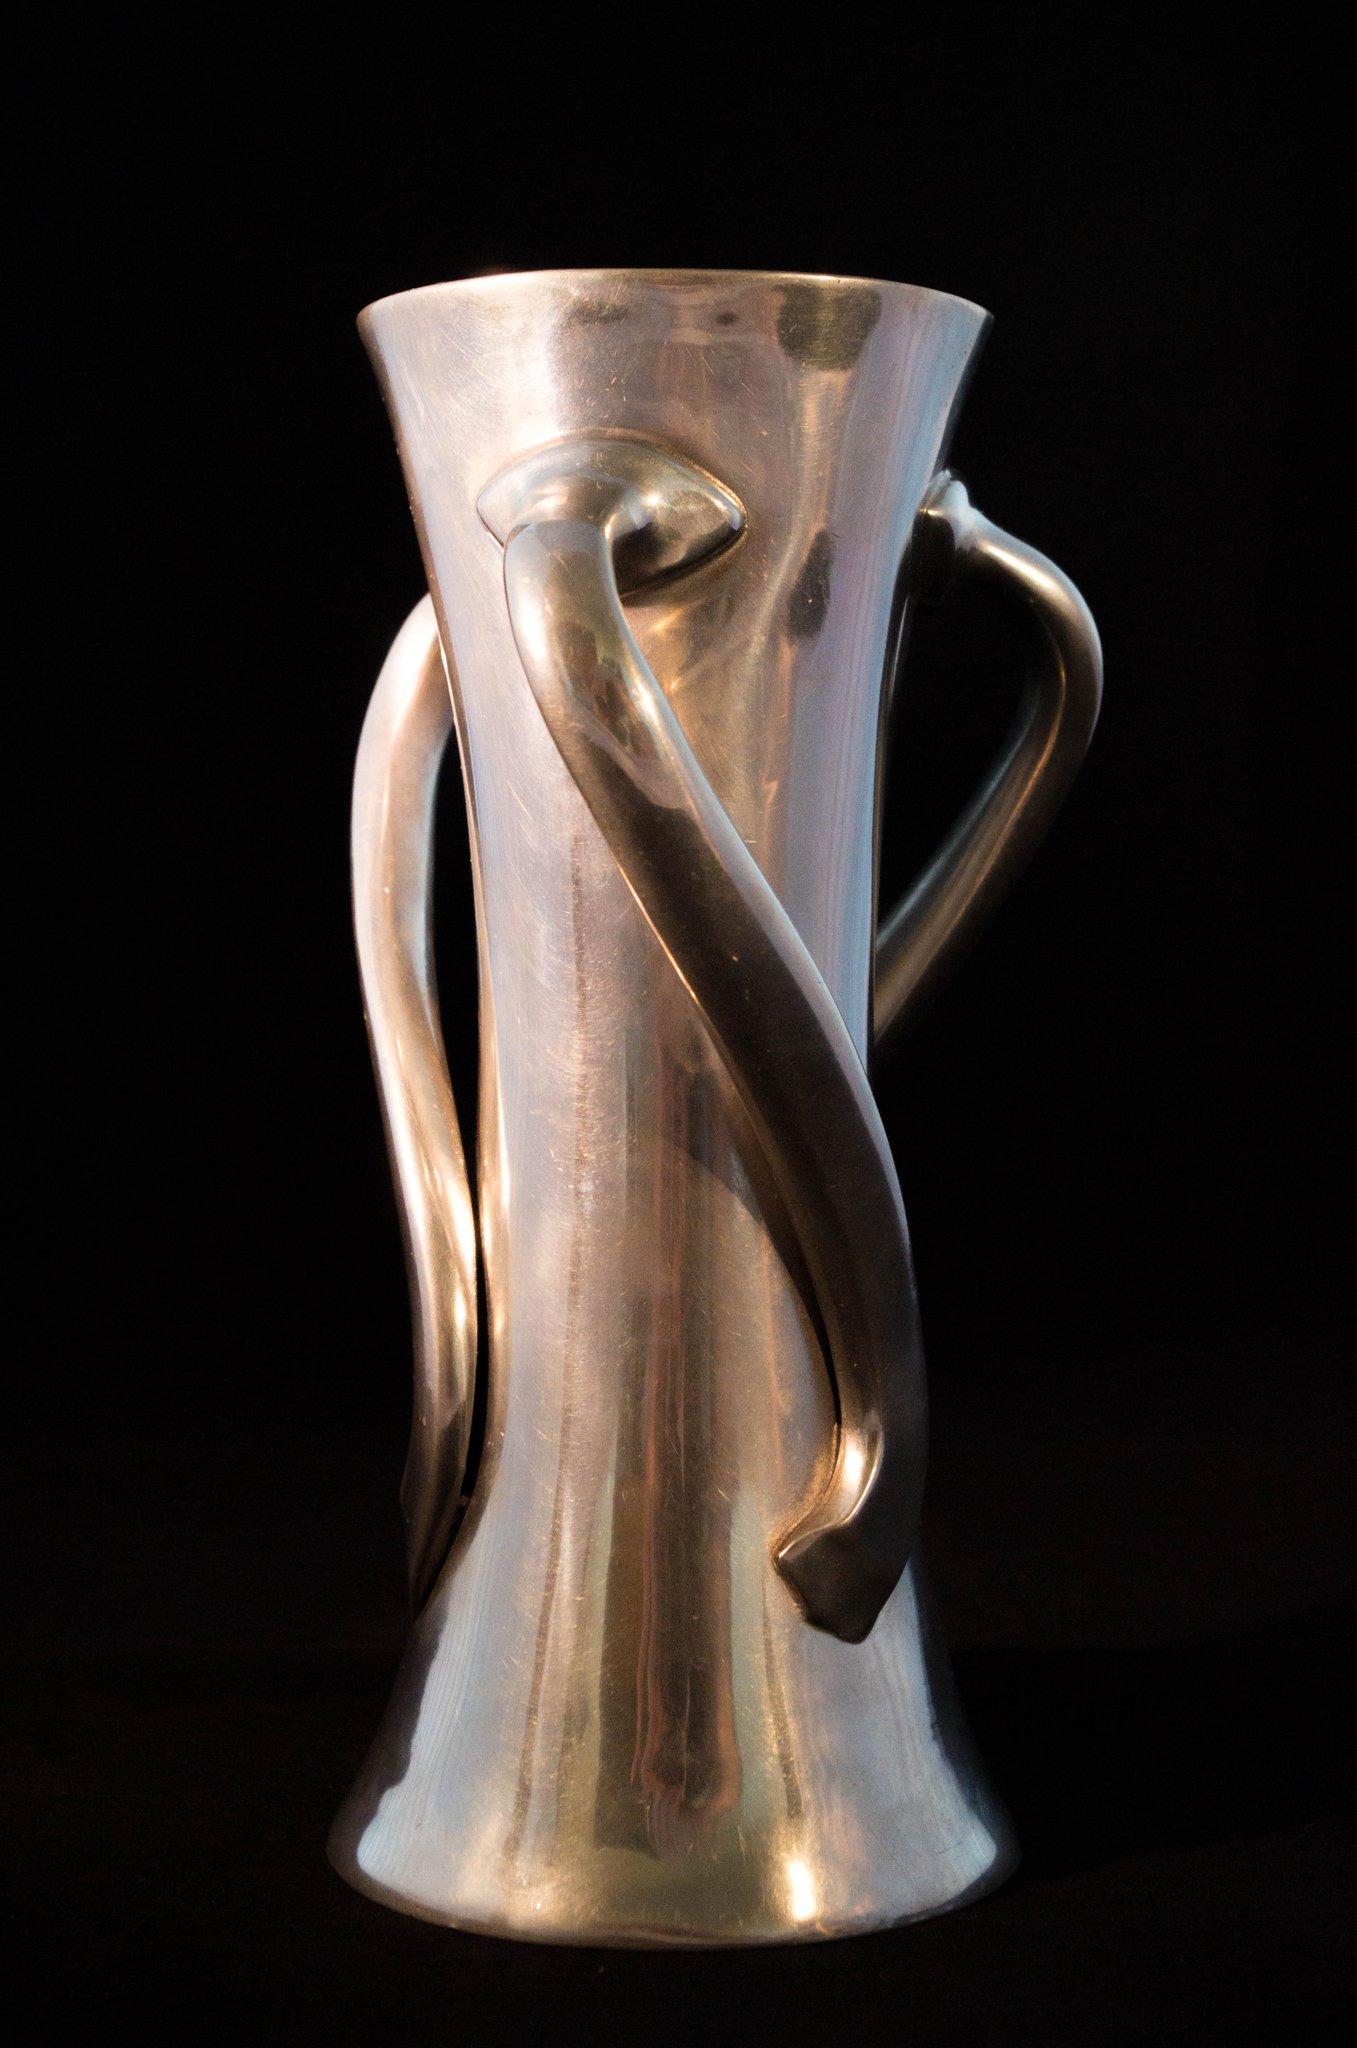 Satin finish pewter vase with three handles, style #030. ca. 1903.